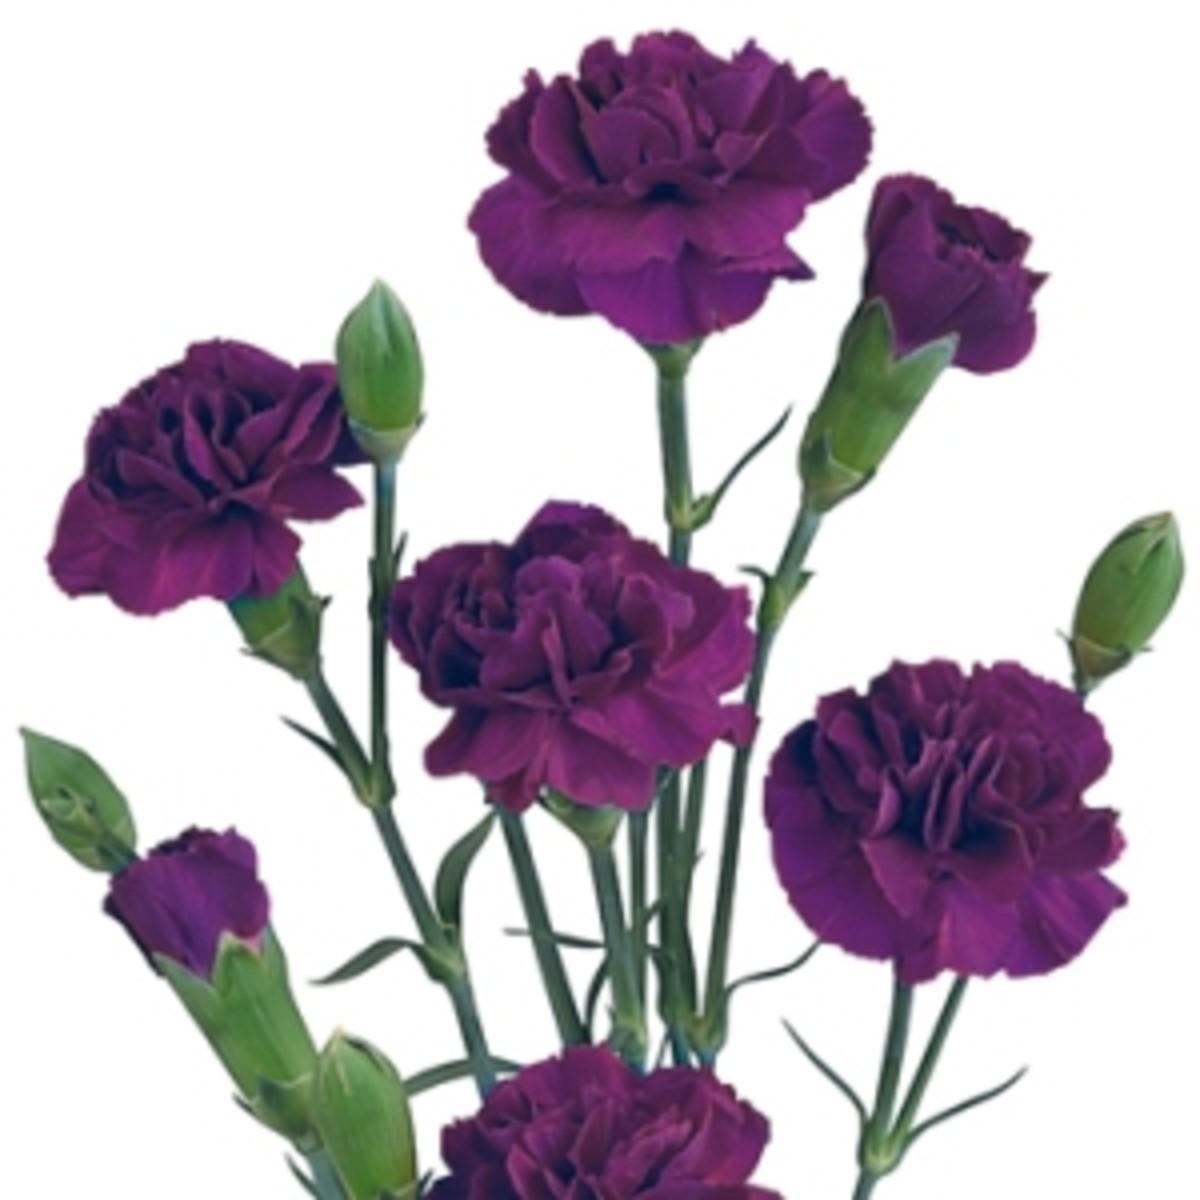 the pink carnation - Carnation Flower Colors